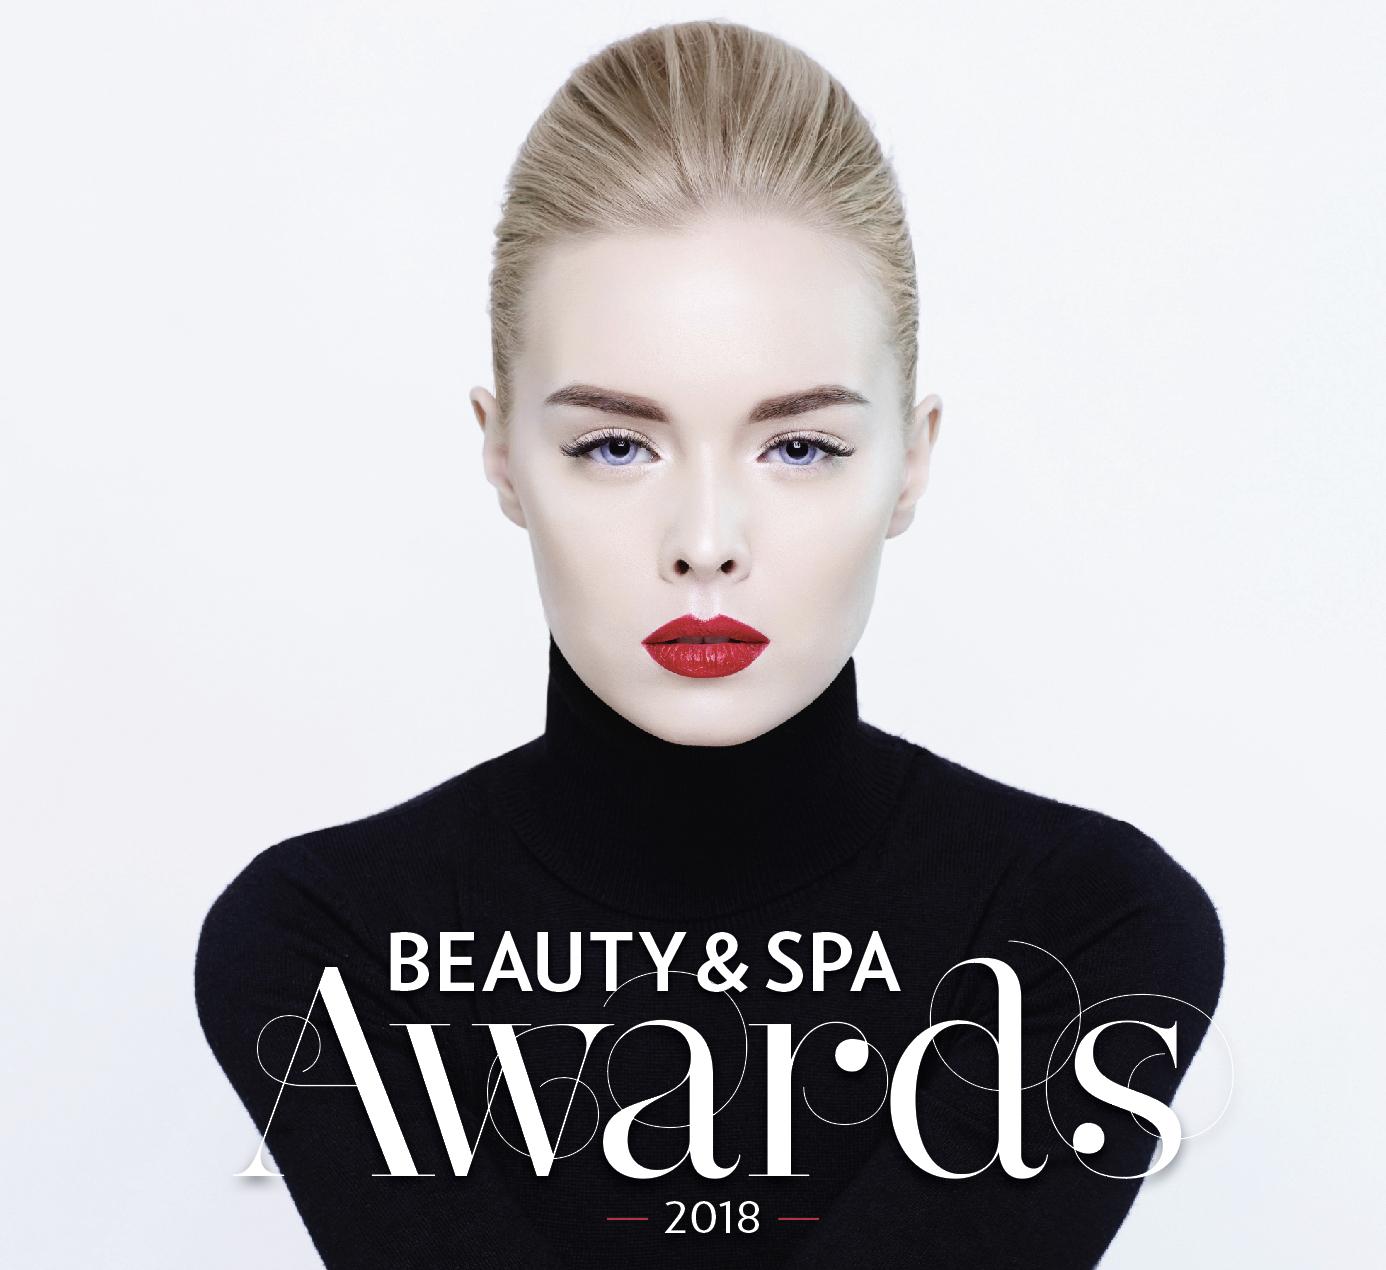 Beauty and Spa Awards 2018 (Make-up)